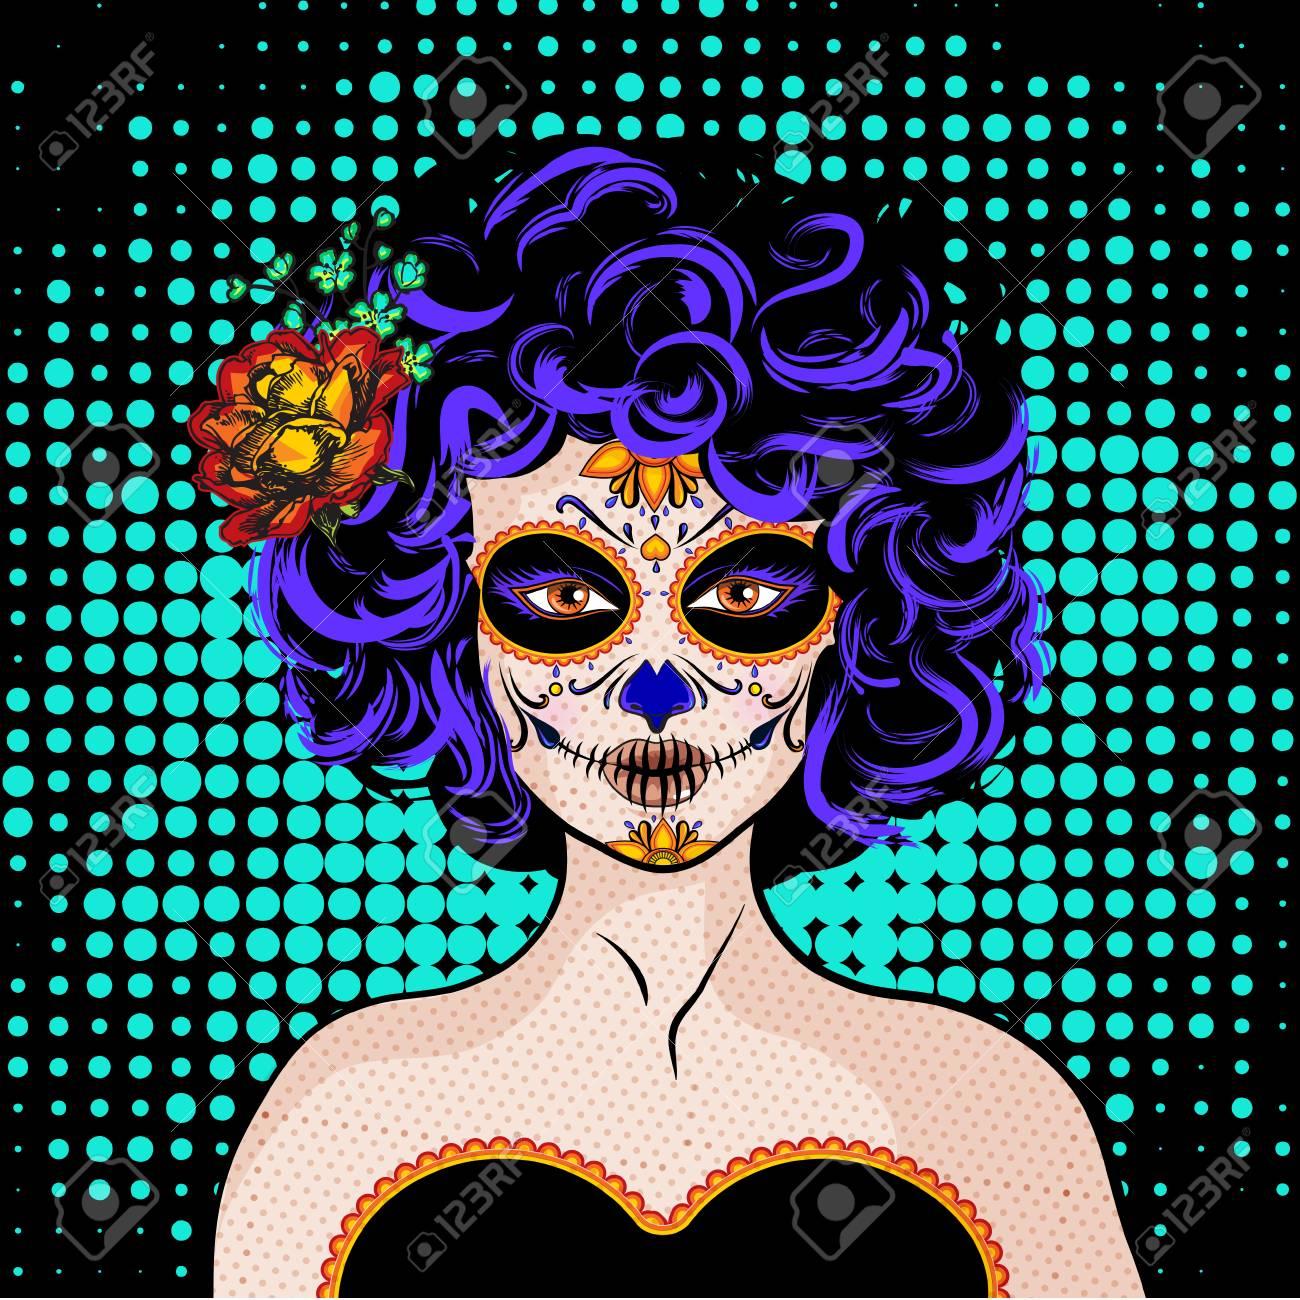 Pop art woman in halloween theme design. - 89679091